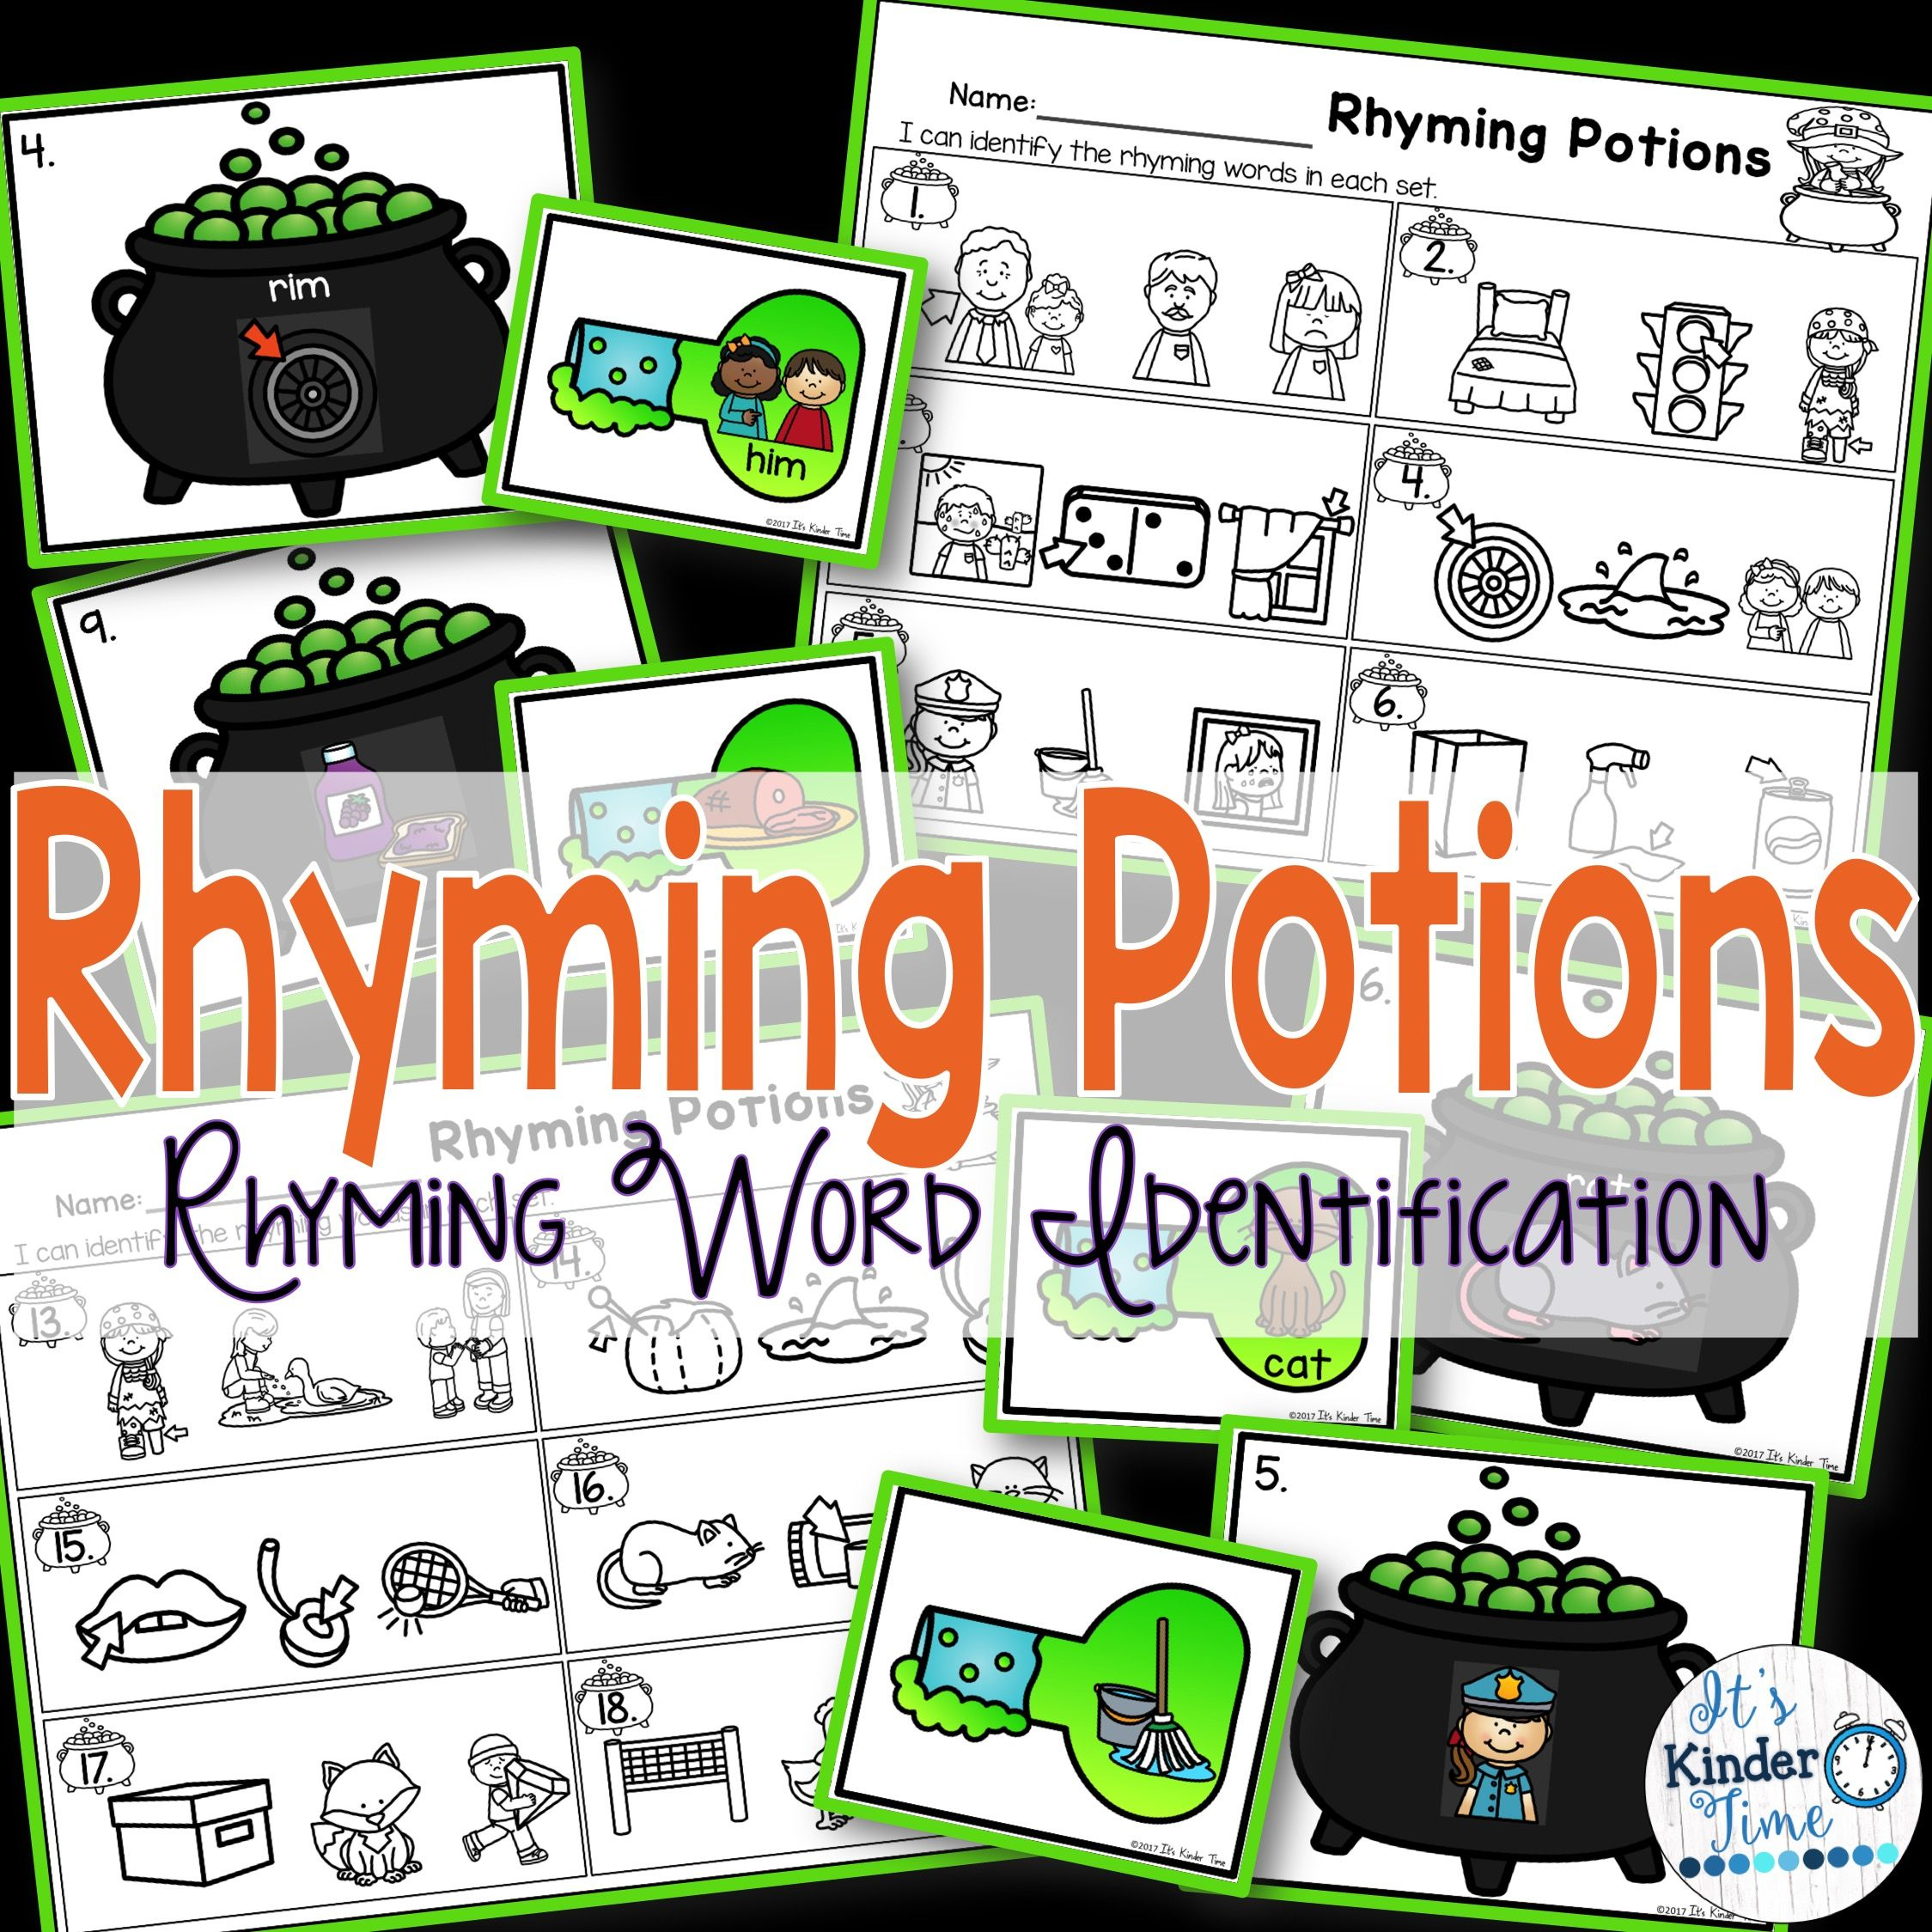 Rhyming Potions